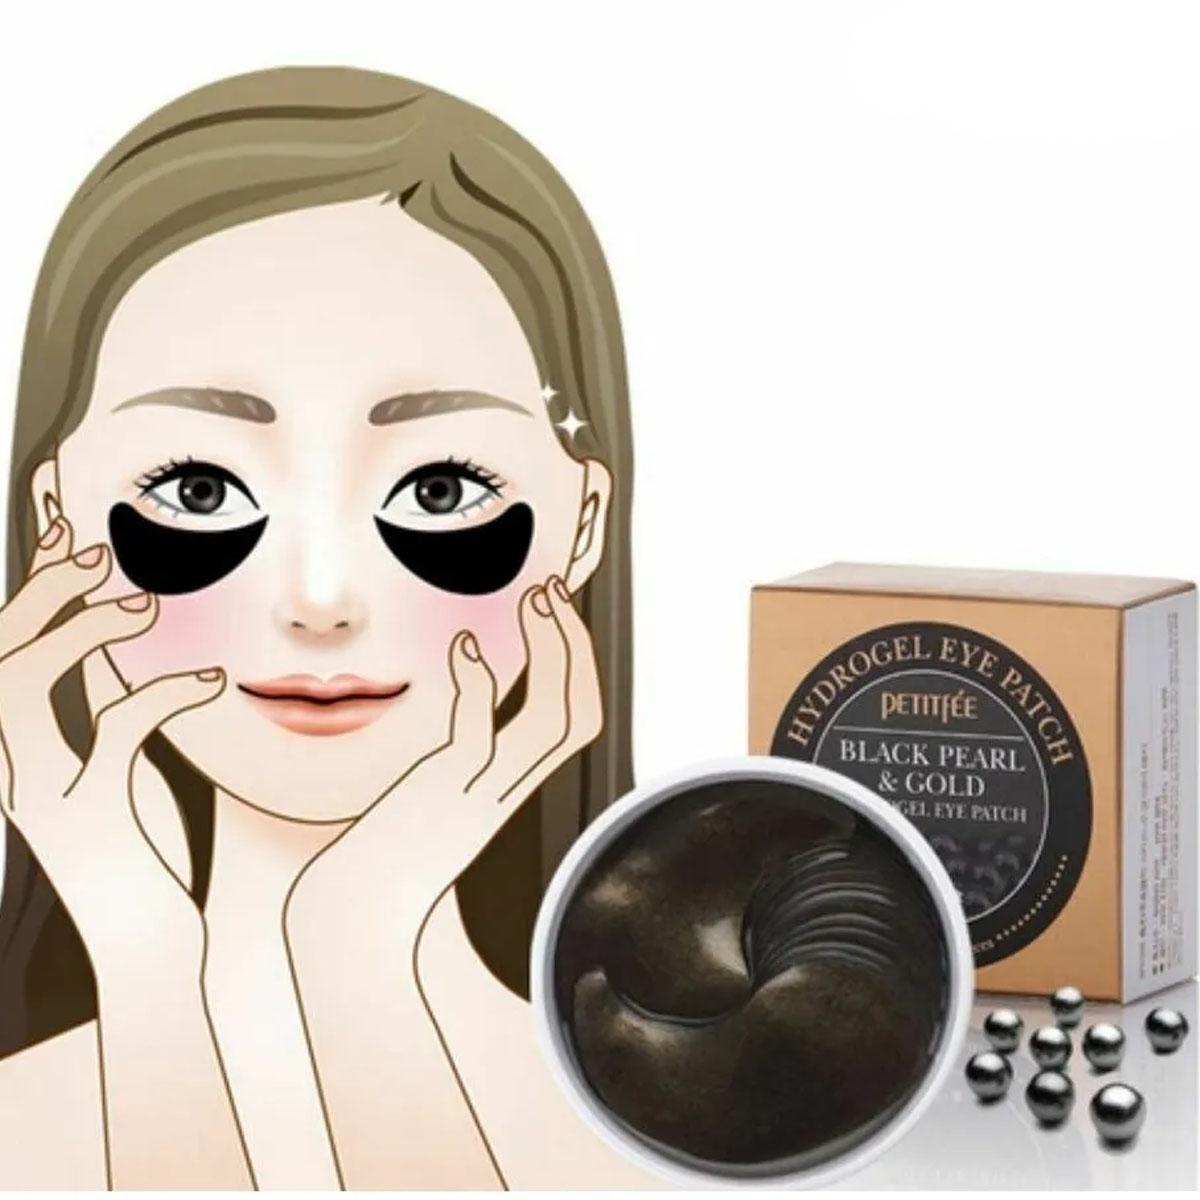 Parche Coreano De Ojo Petitfee Black Pearl & Gold Hydrogel